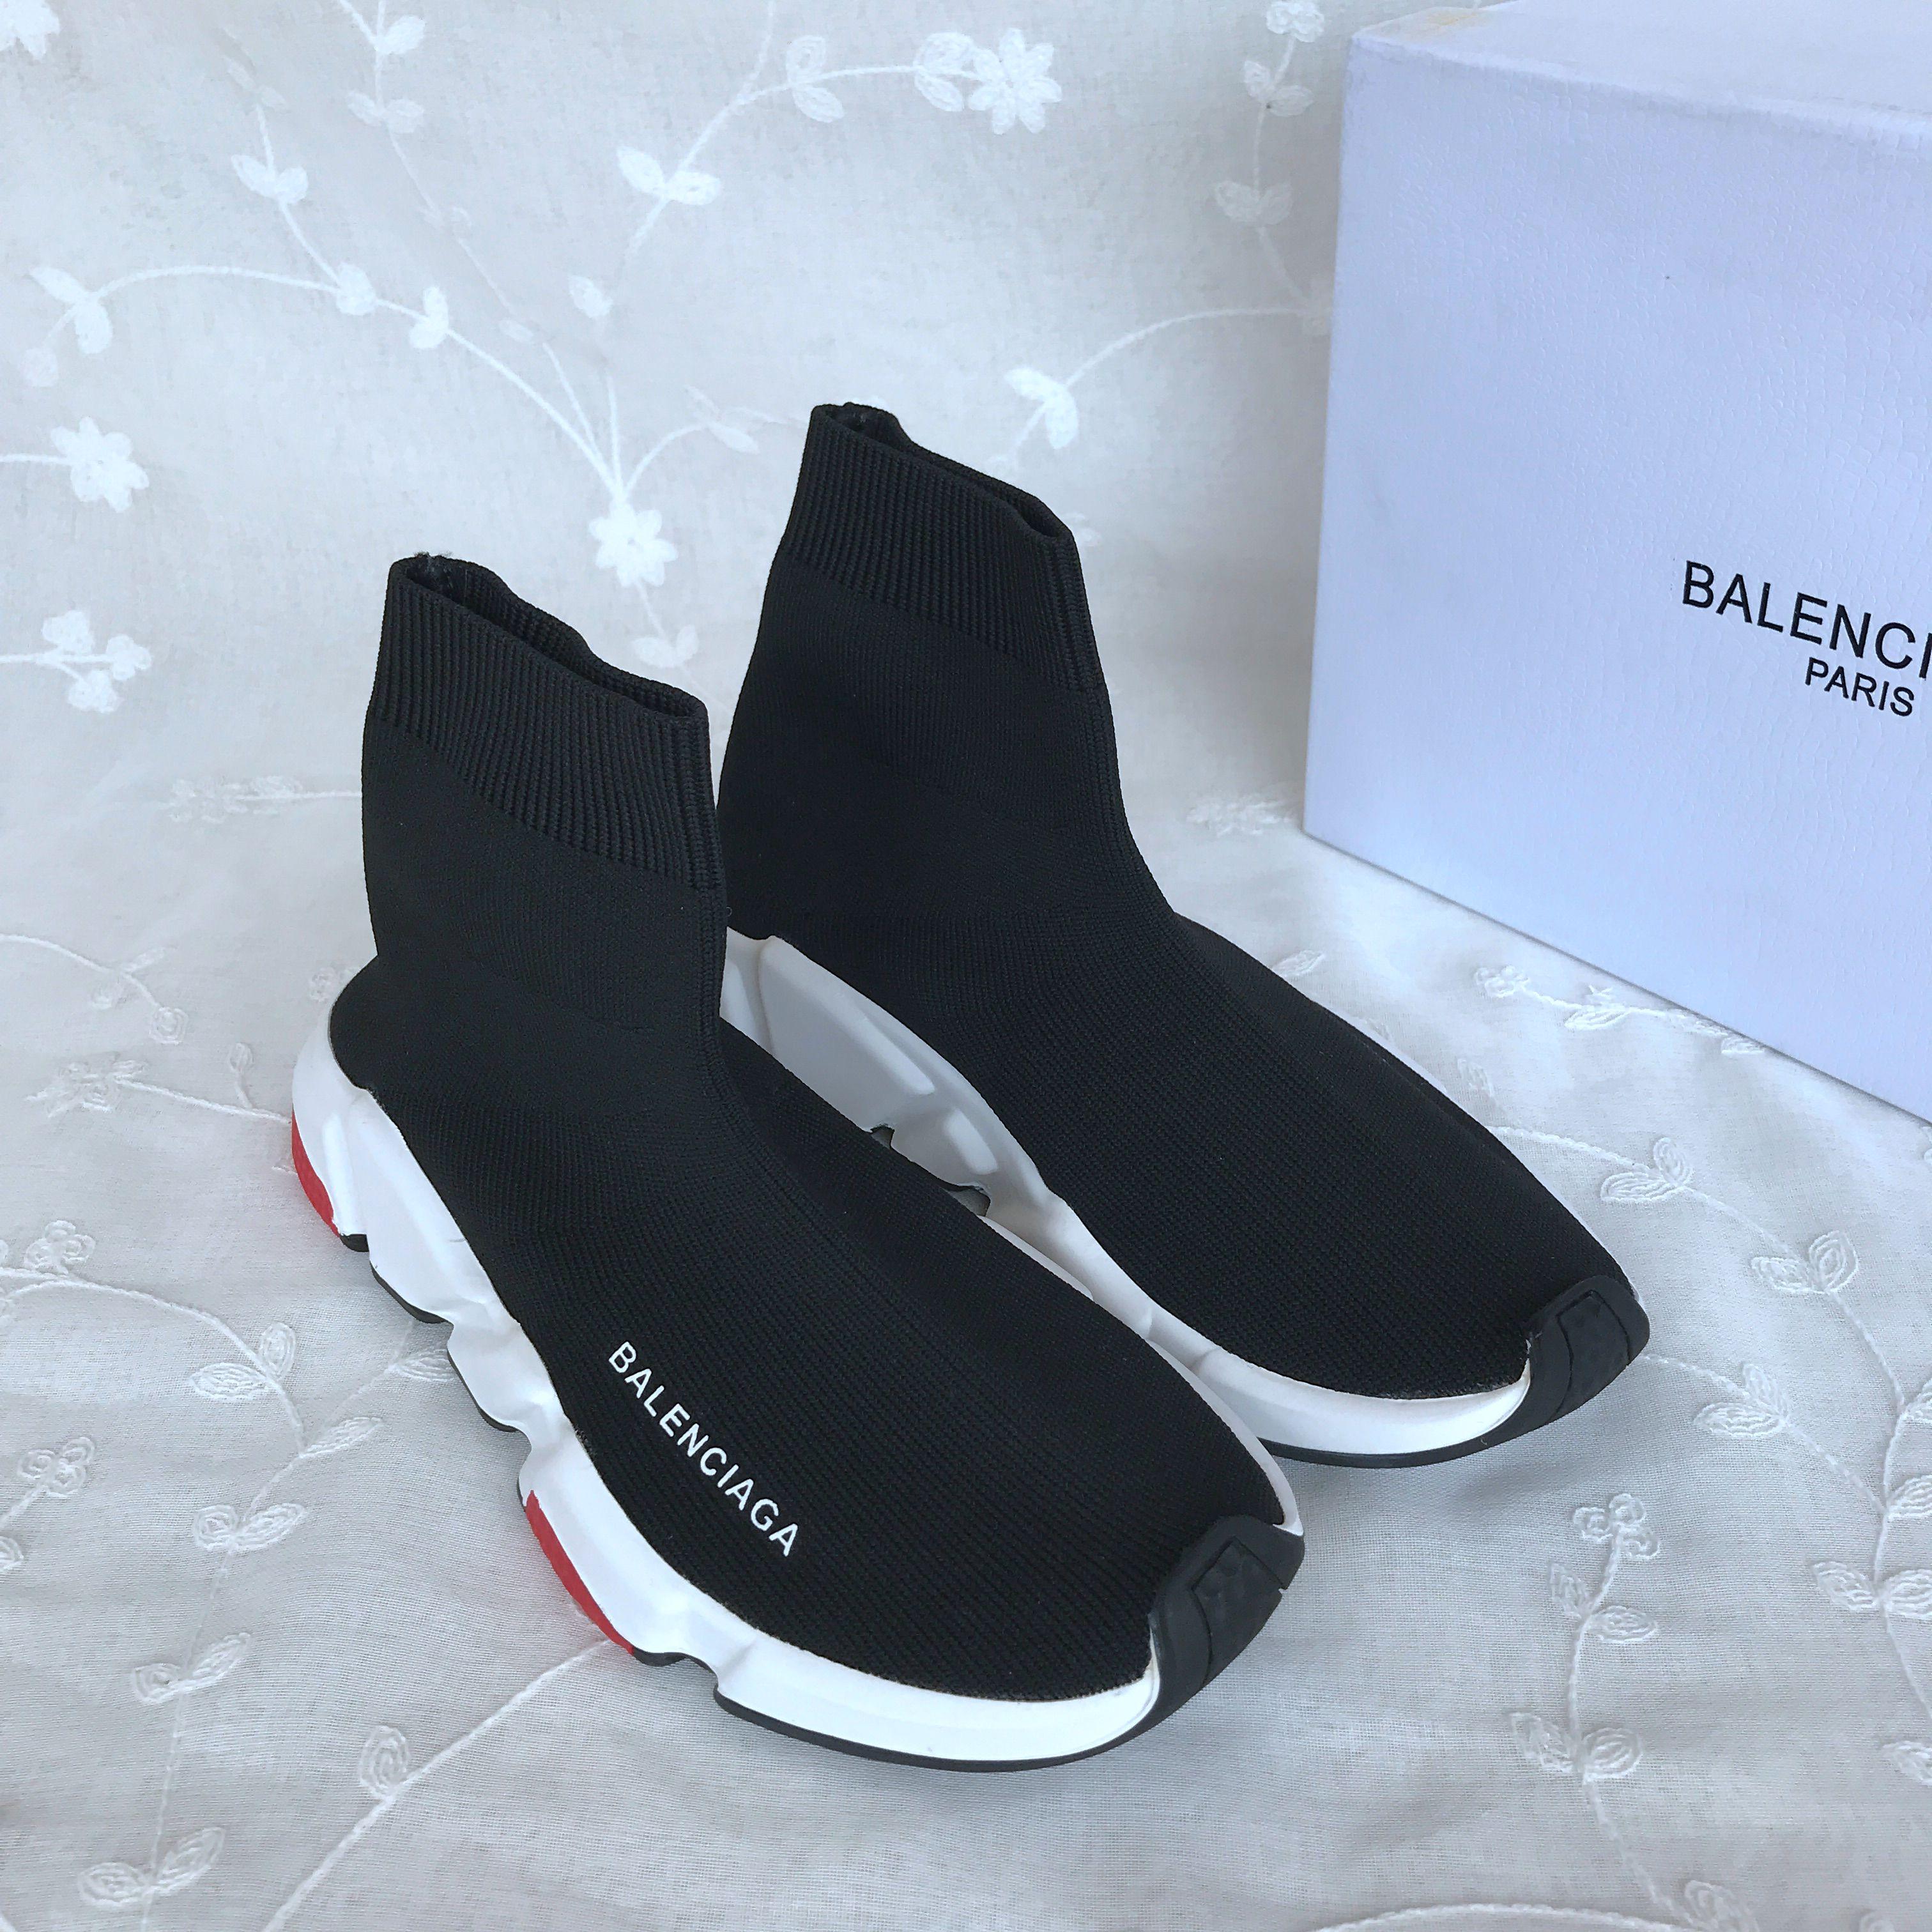 Balenciage Socks shoes  423661